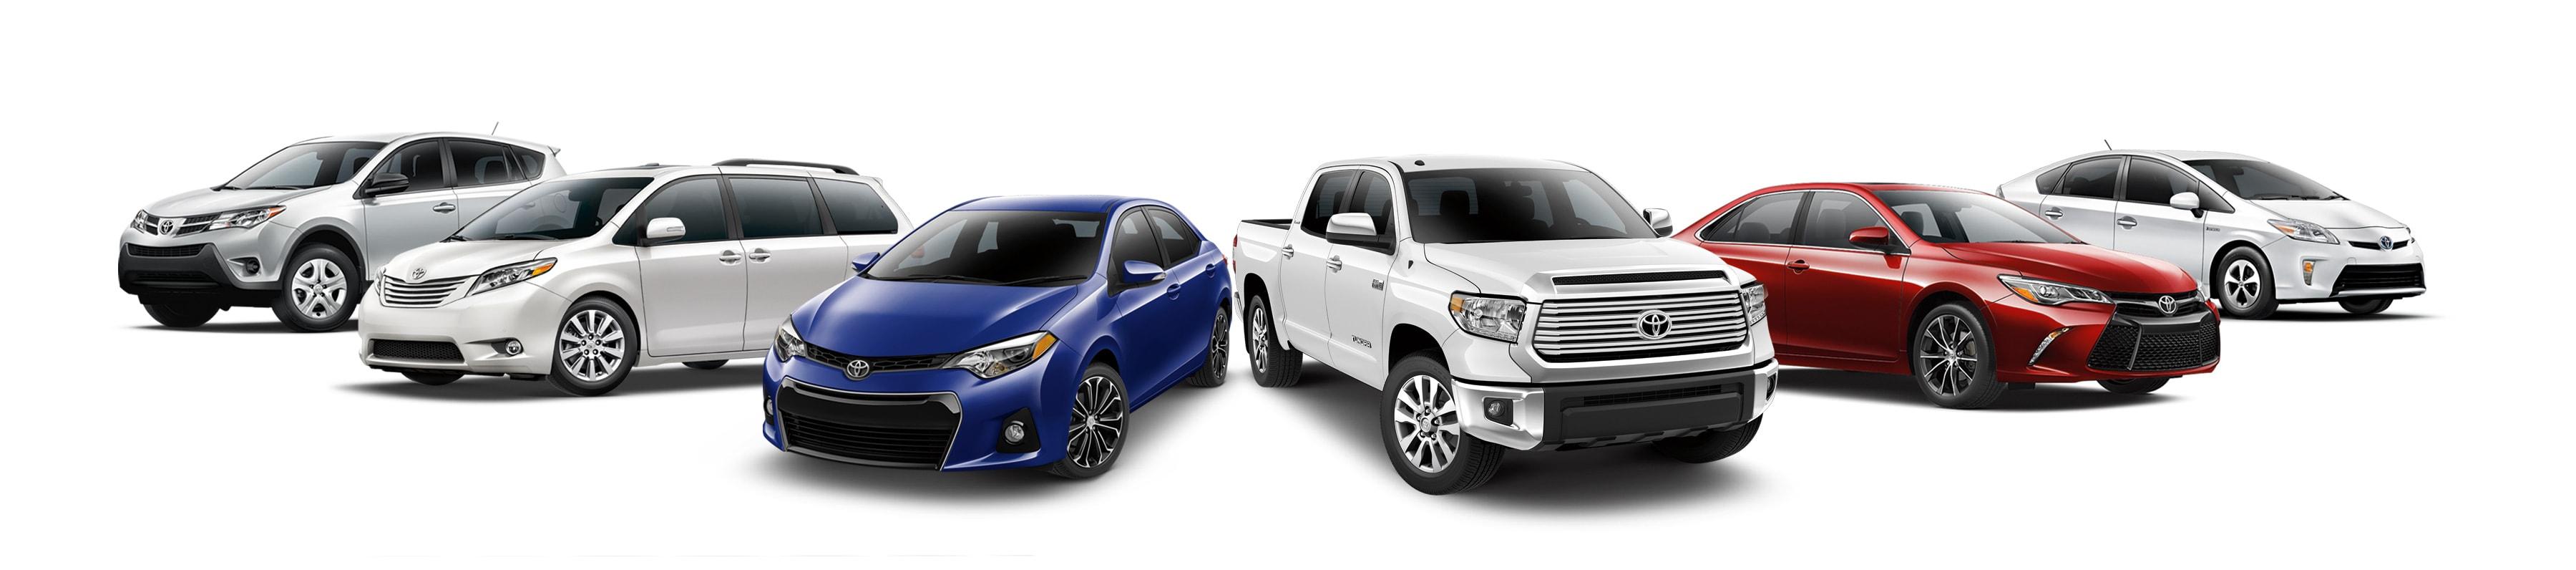 2018 Toyota Models for Sale in Edmonton | Toyota Northwest